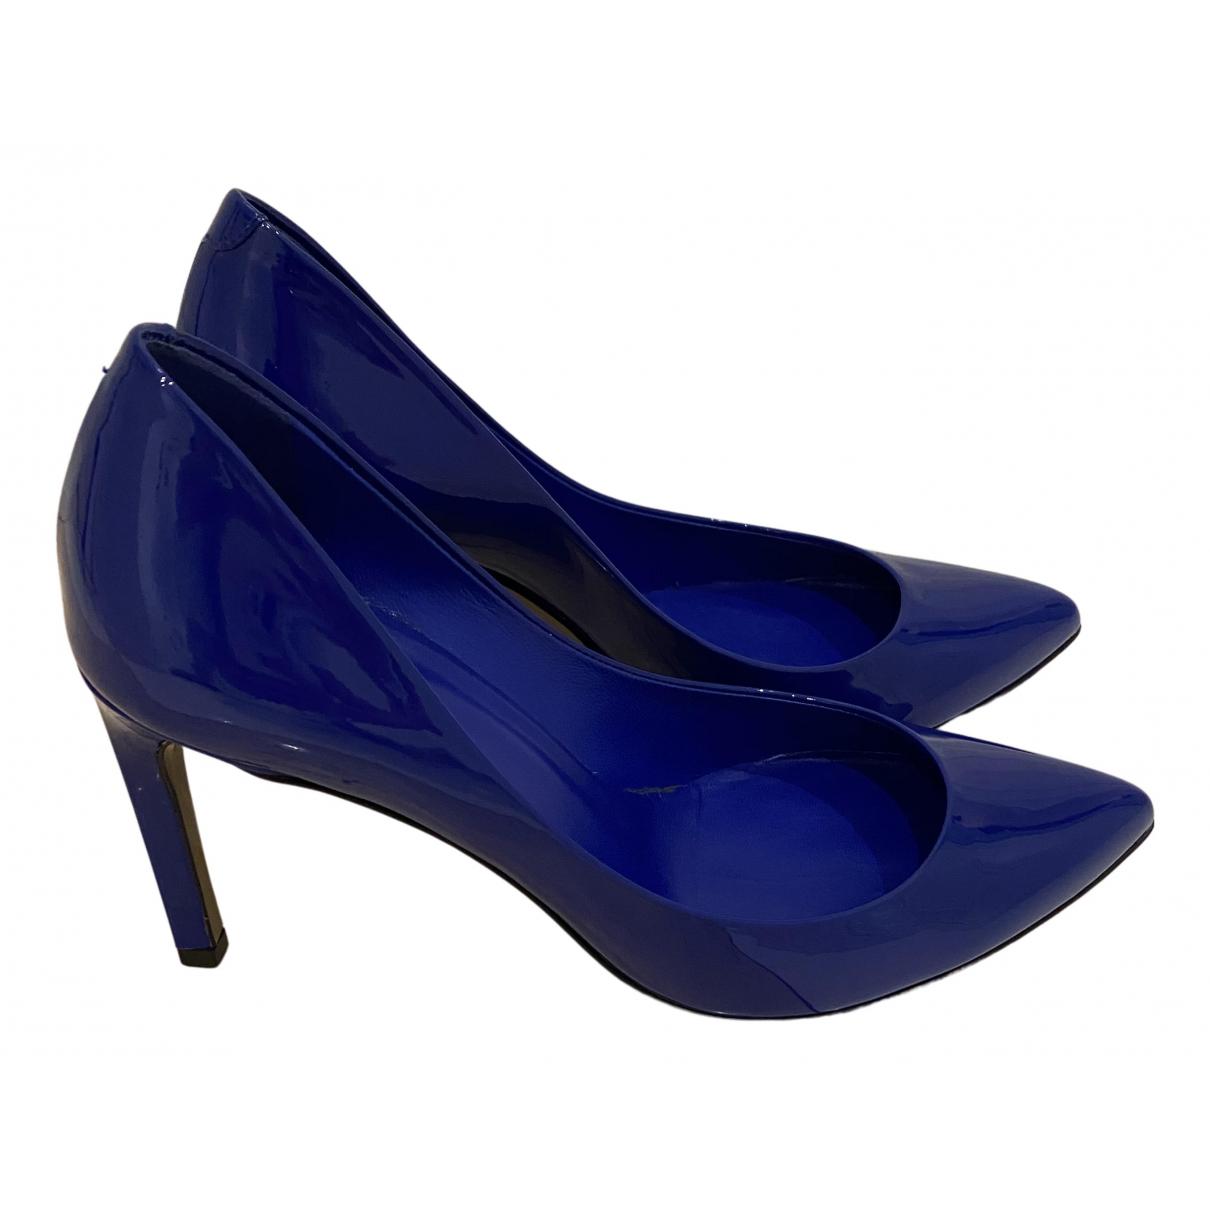 Gucci N Blue Leather Heels for Women 35 EU